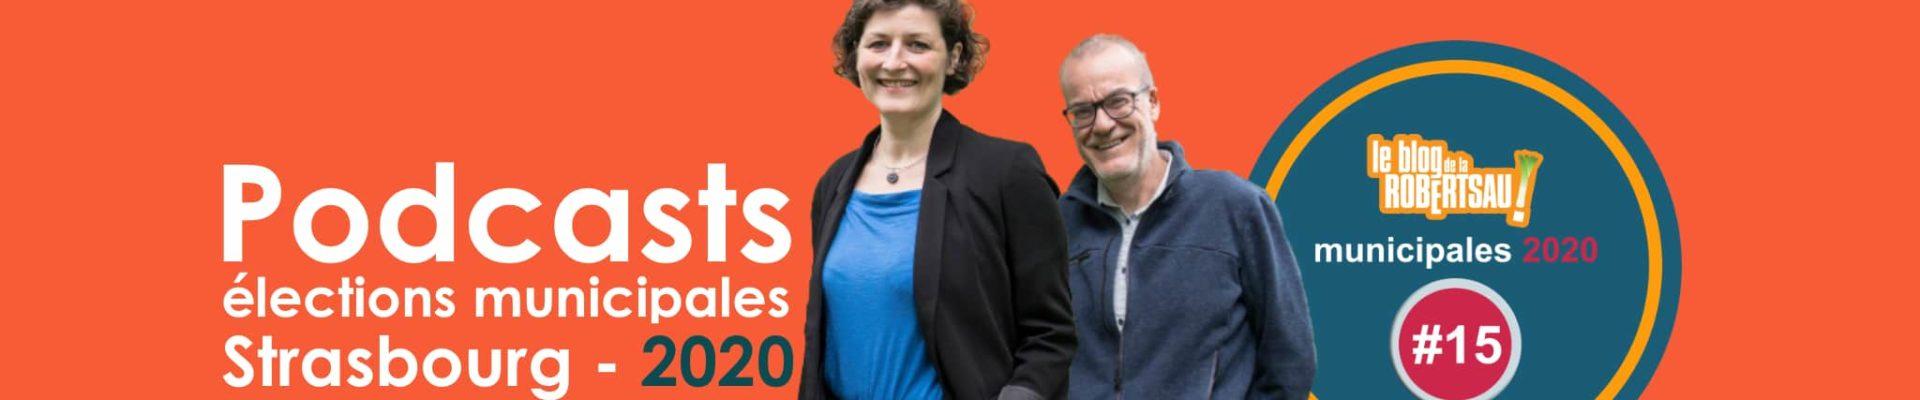 Podcast de la Robertsau #15 – Jeanne Barseghian et Marc Hoffsess – Strasbourg Ecologiste et Citoyenne